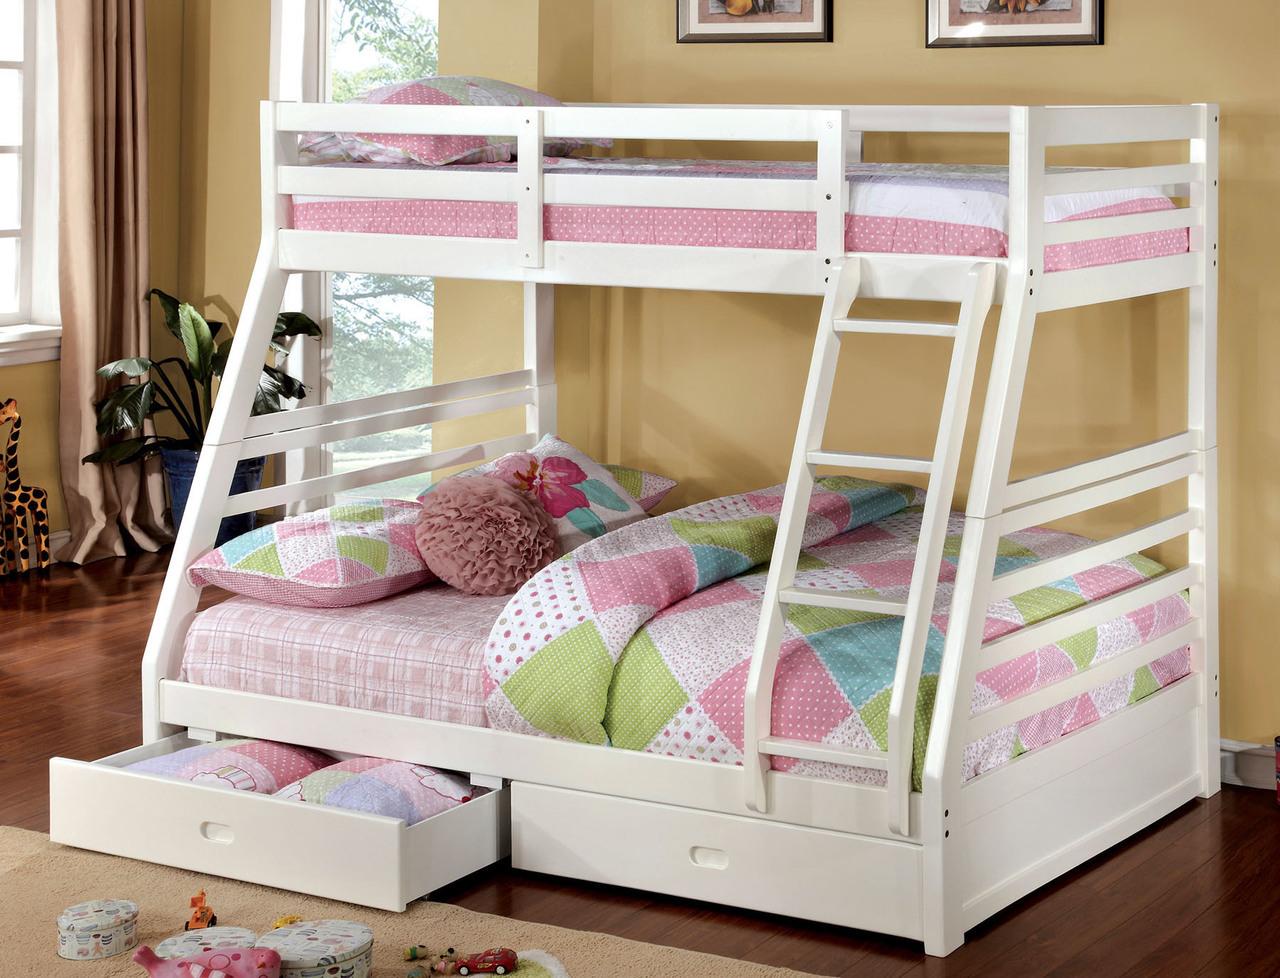 bunk-bed-10.jpg